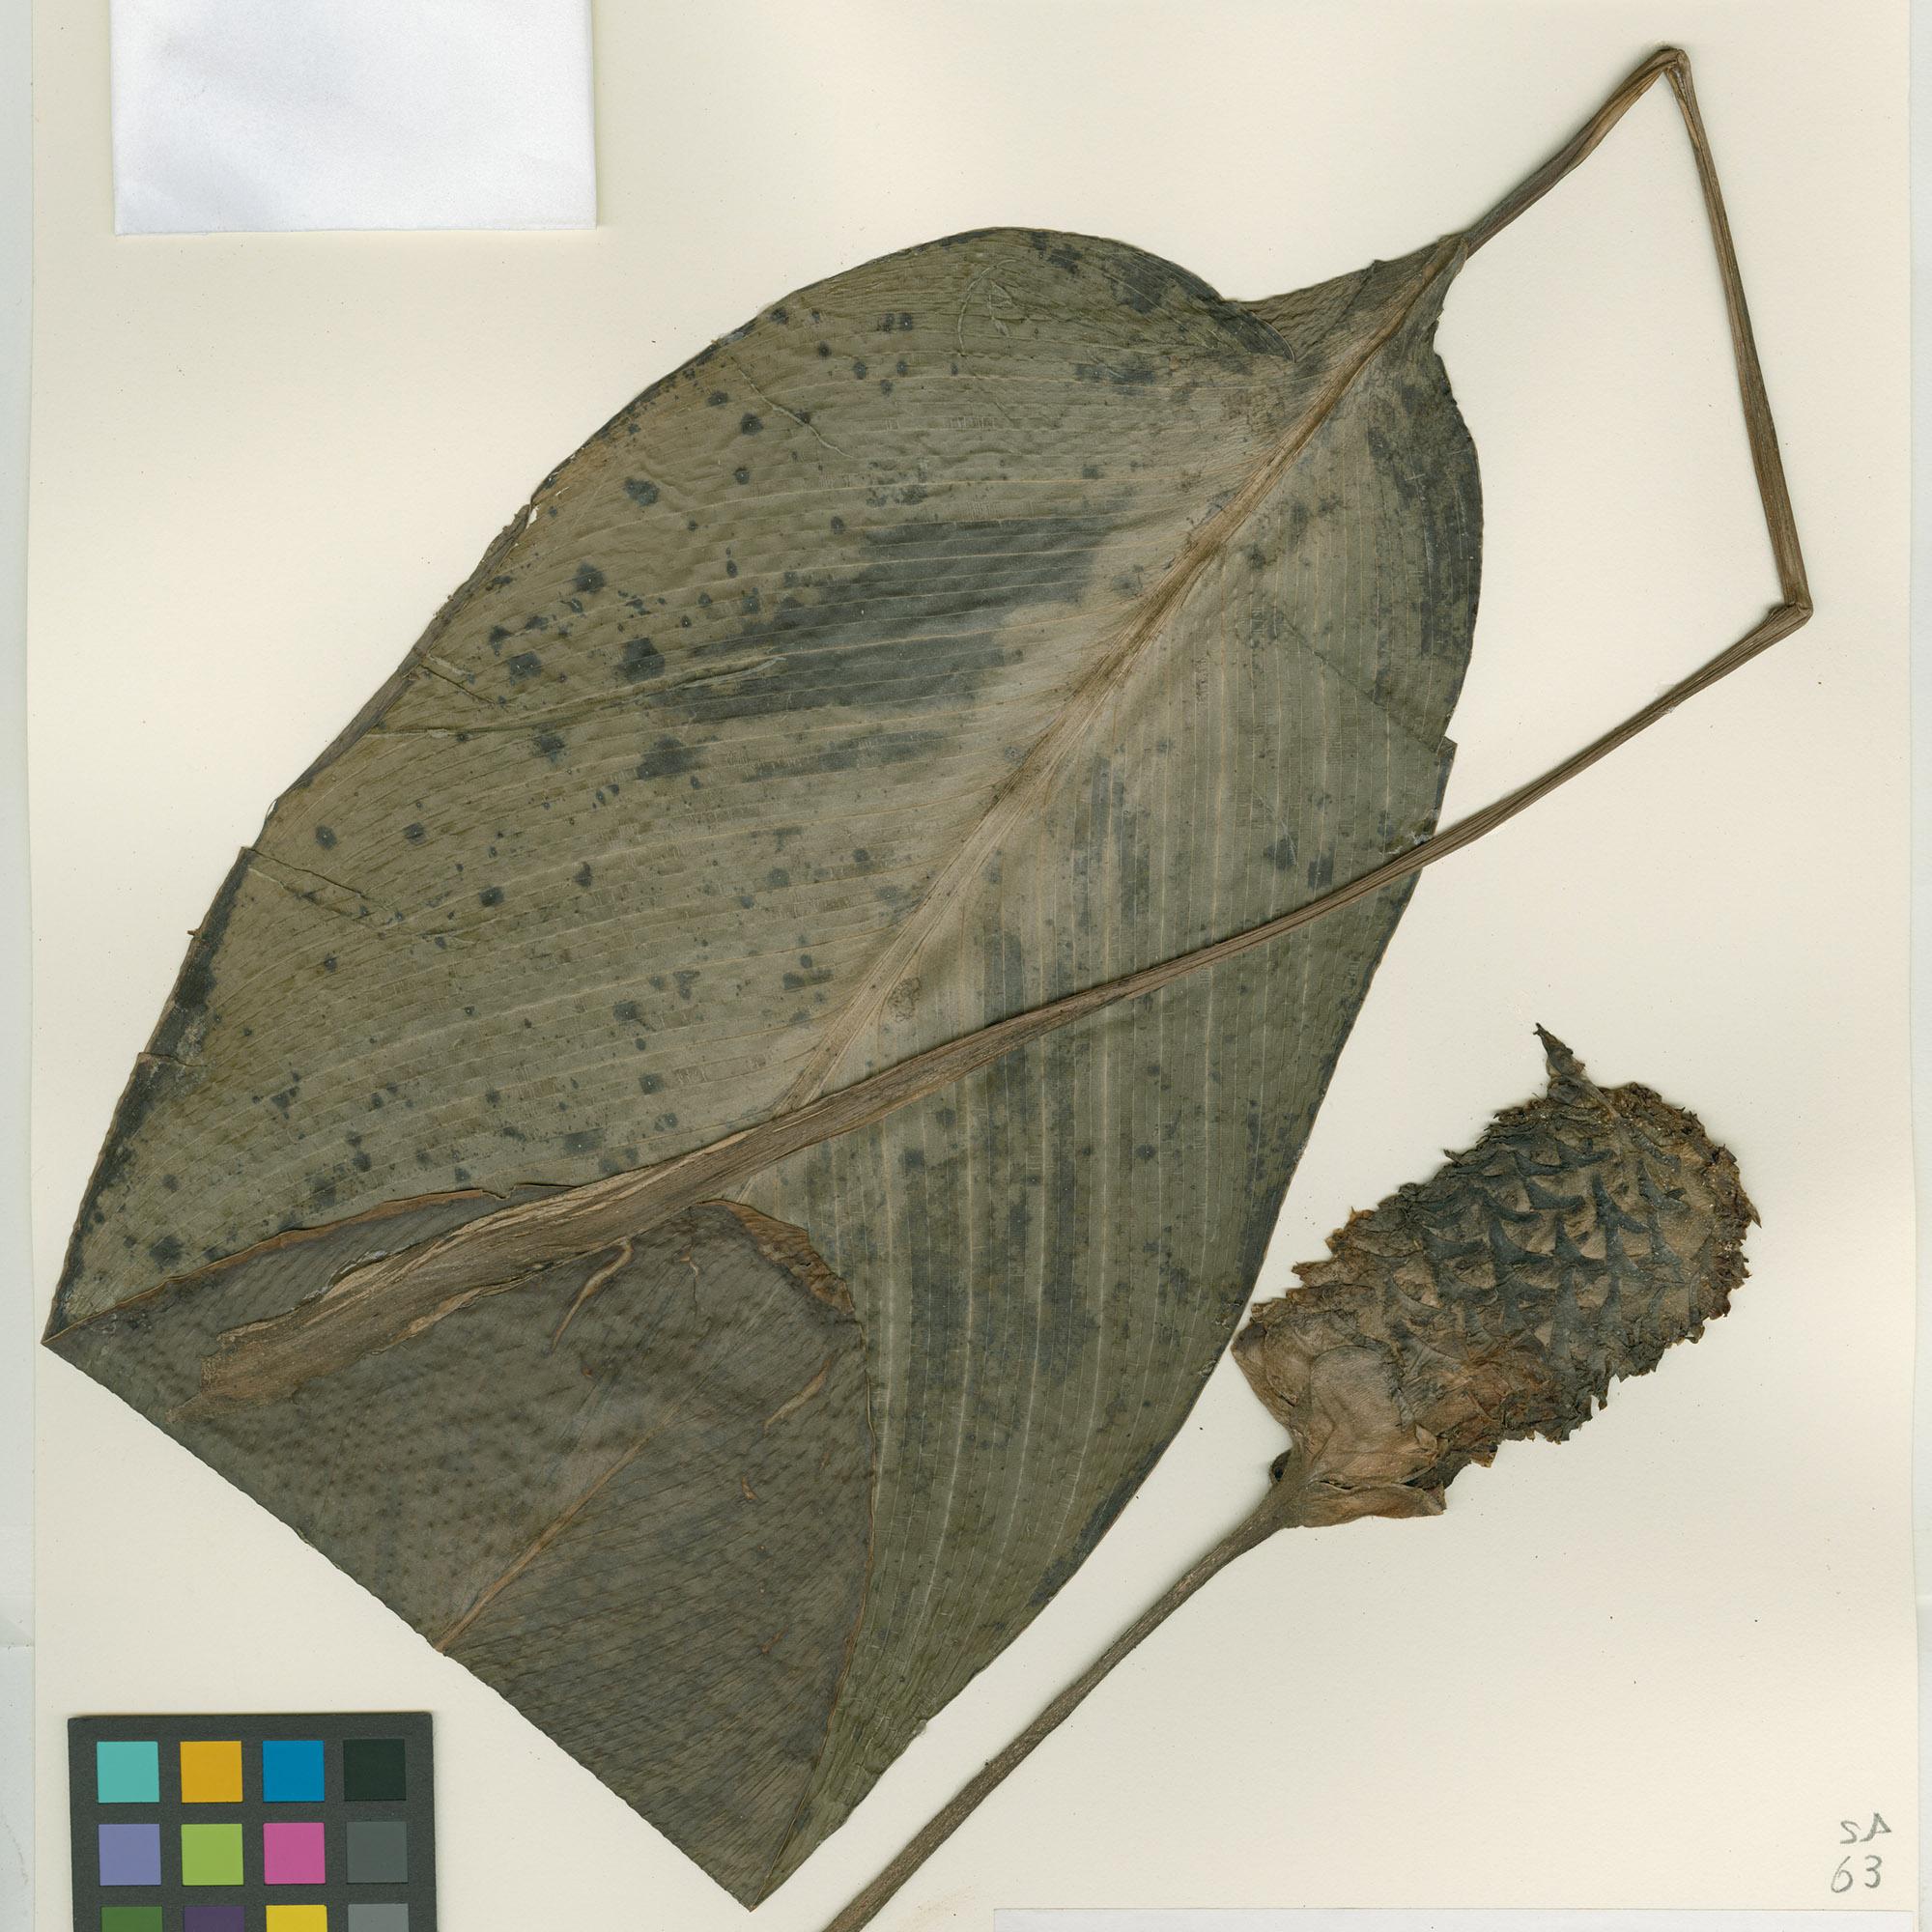 <em>Calathea grazielae</em> H.Kenn. & Marcelo